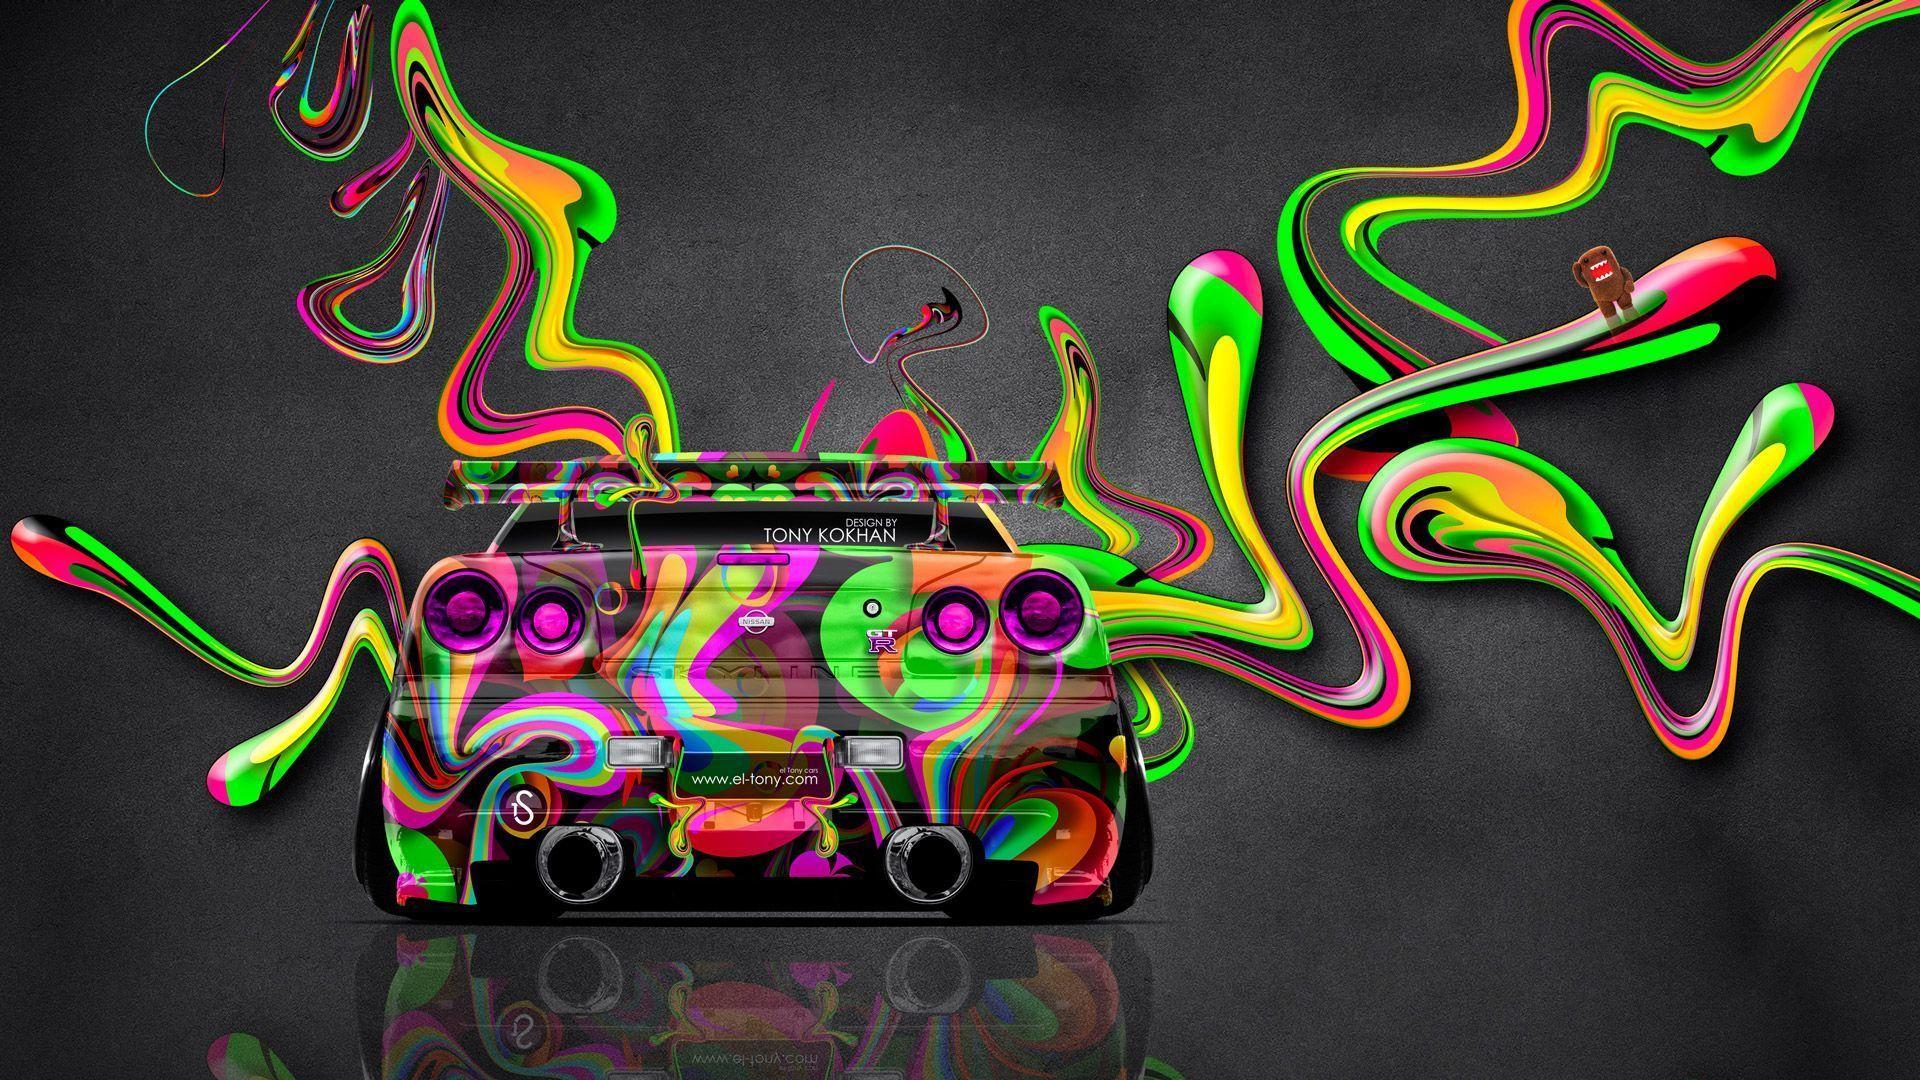 Charming Nissan Skyline GTR R34 JDM Super Plastic Car 2014 « El Tony